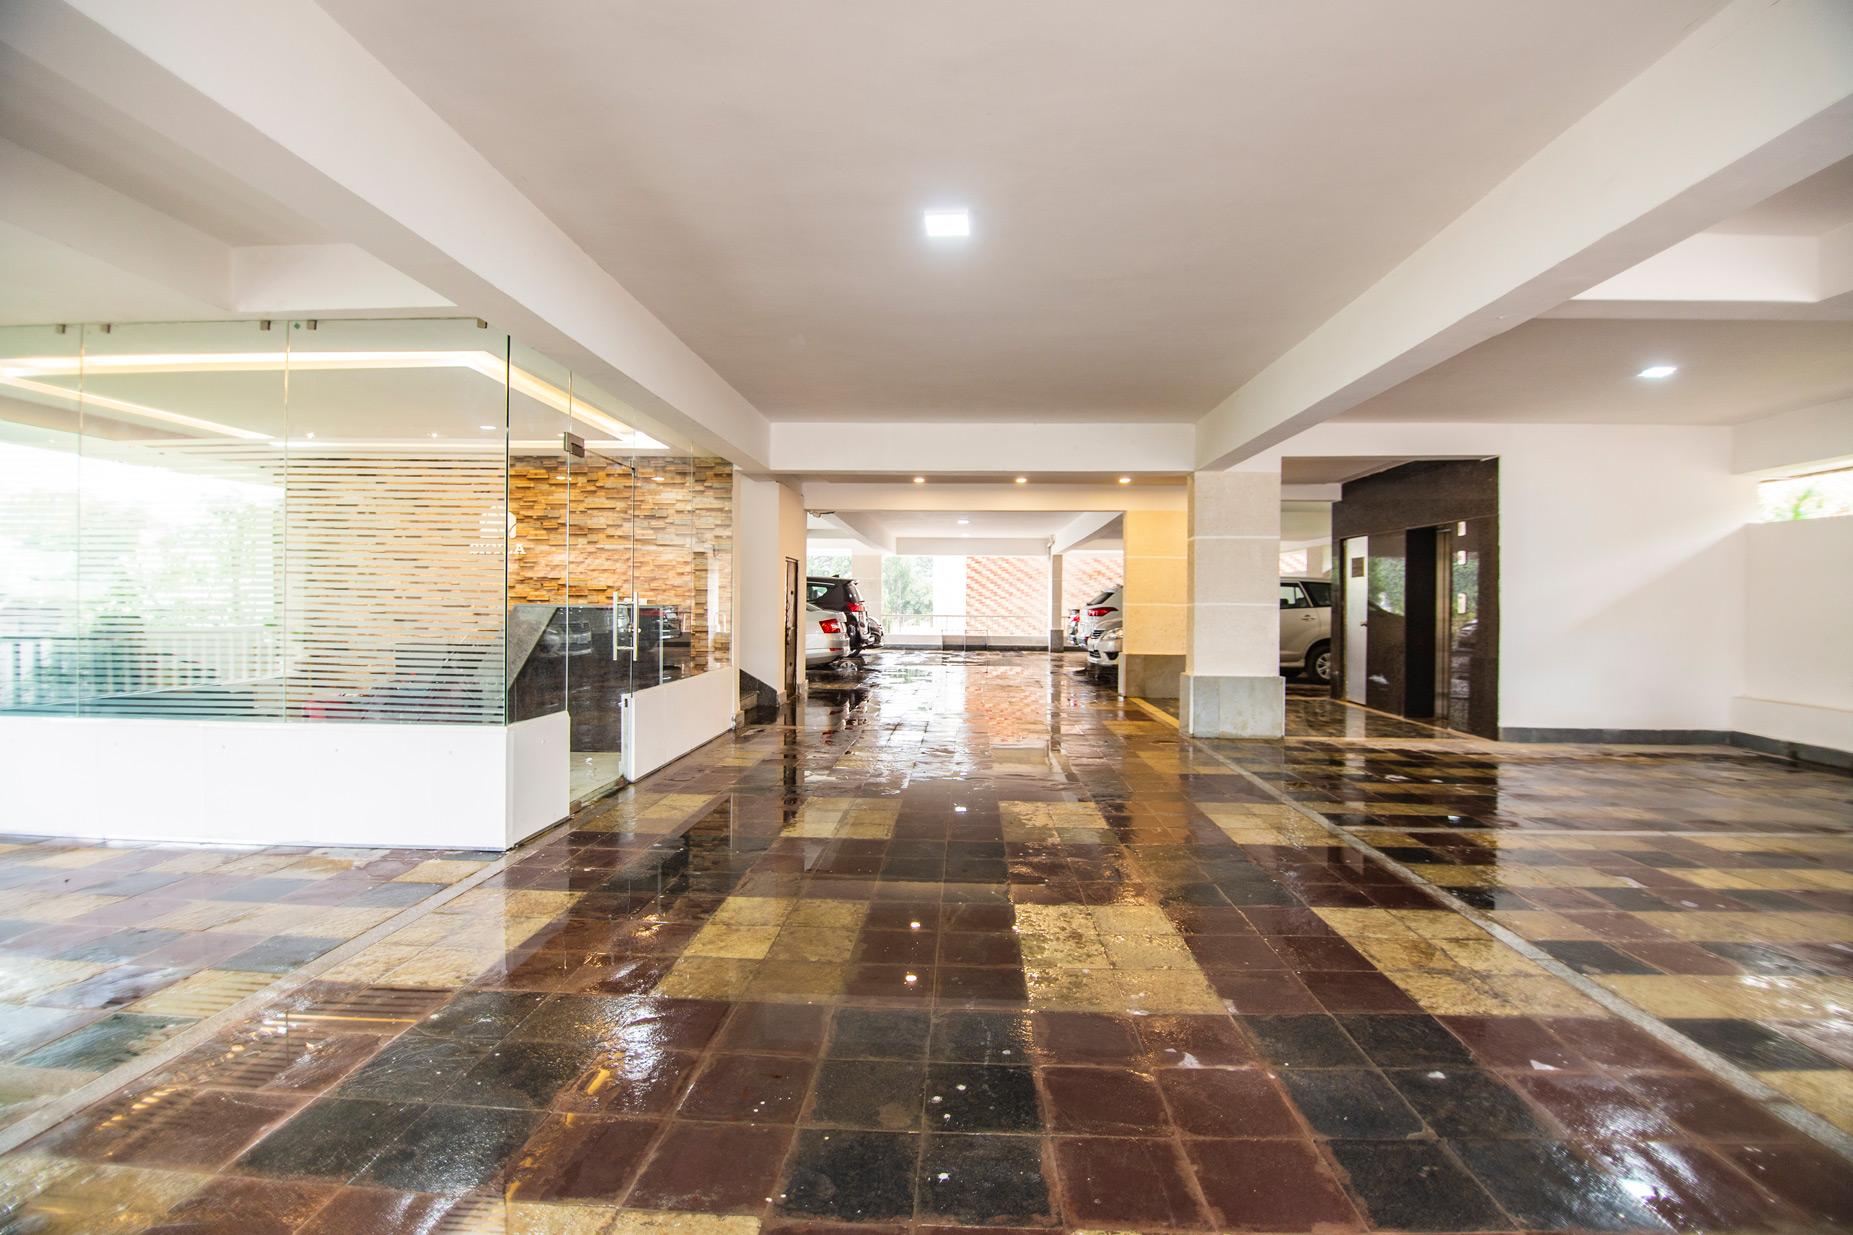 skyla-service-apartment-hyderabad-banjara-hills-bluefox-restaurant-3bhk9.jpg